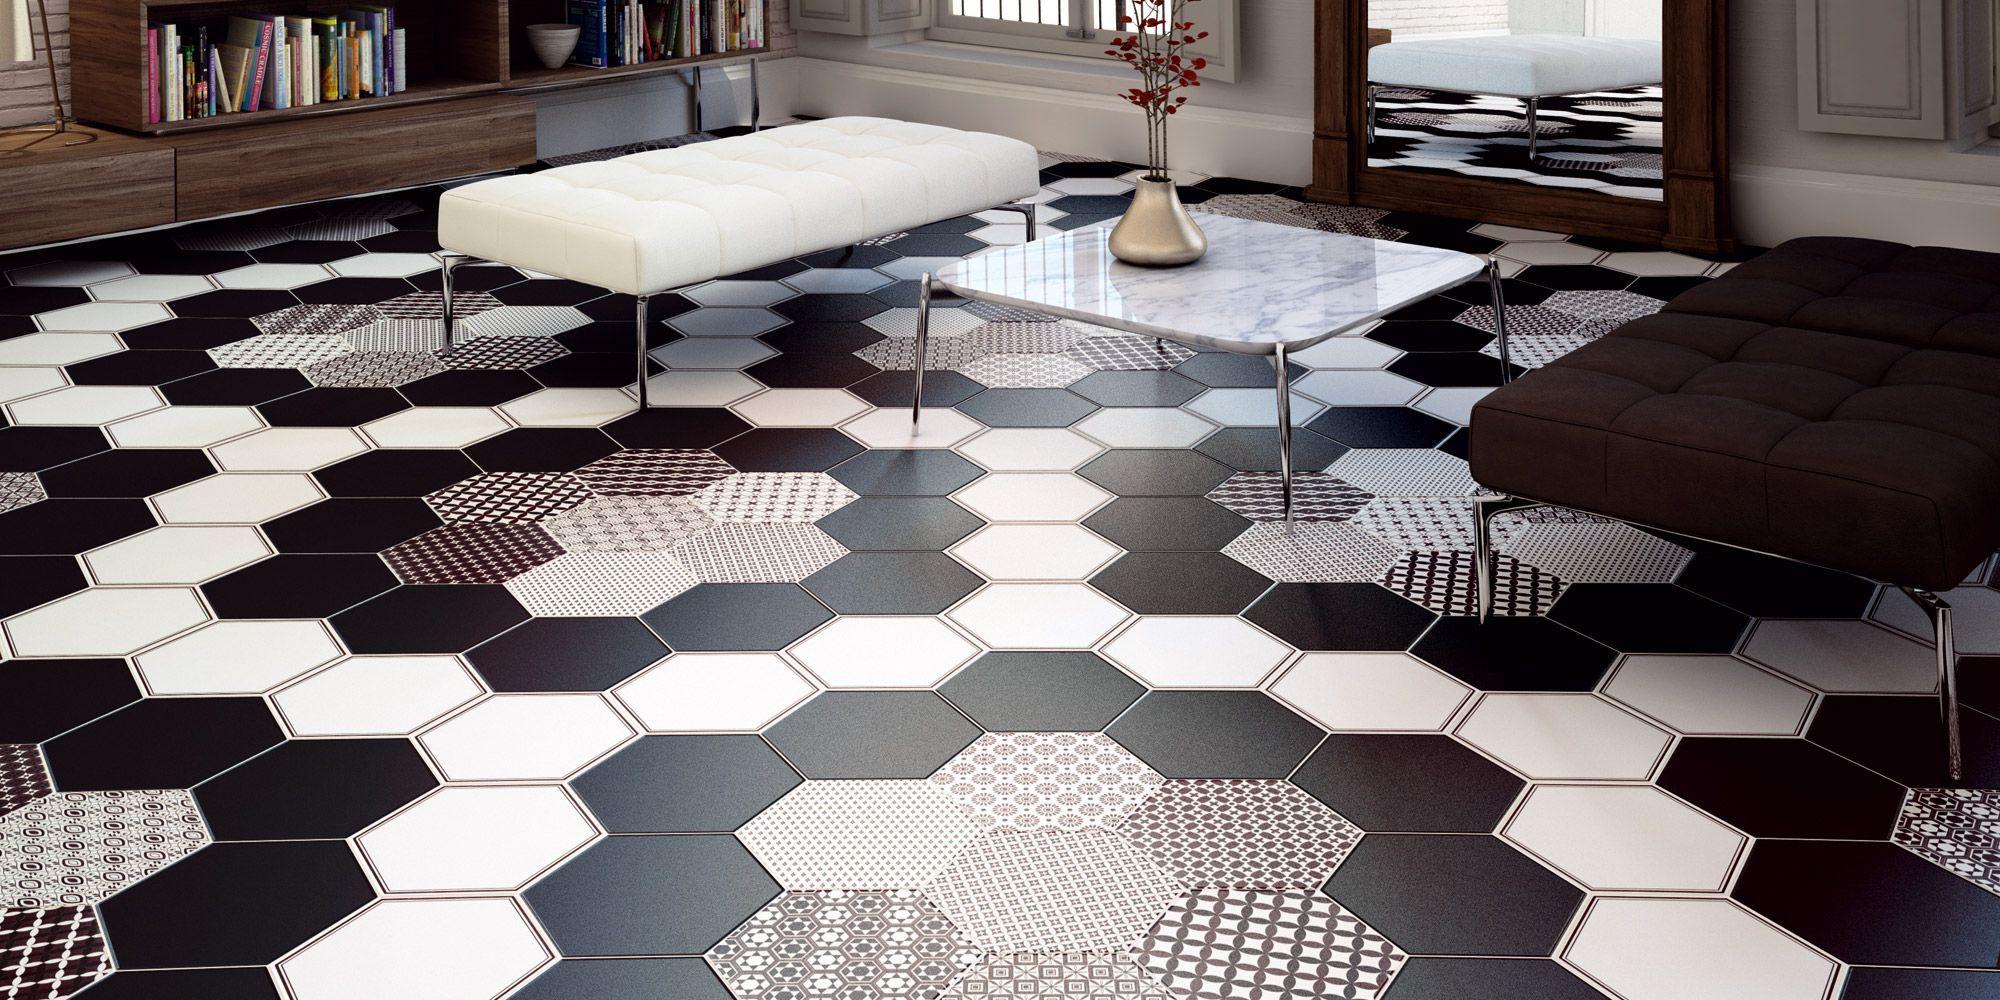 Realonda grazia series black and white ceramic tile from tile of black and white ceramic tile from tile of spain doublecrazyfo Image collections